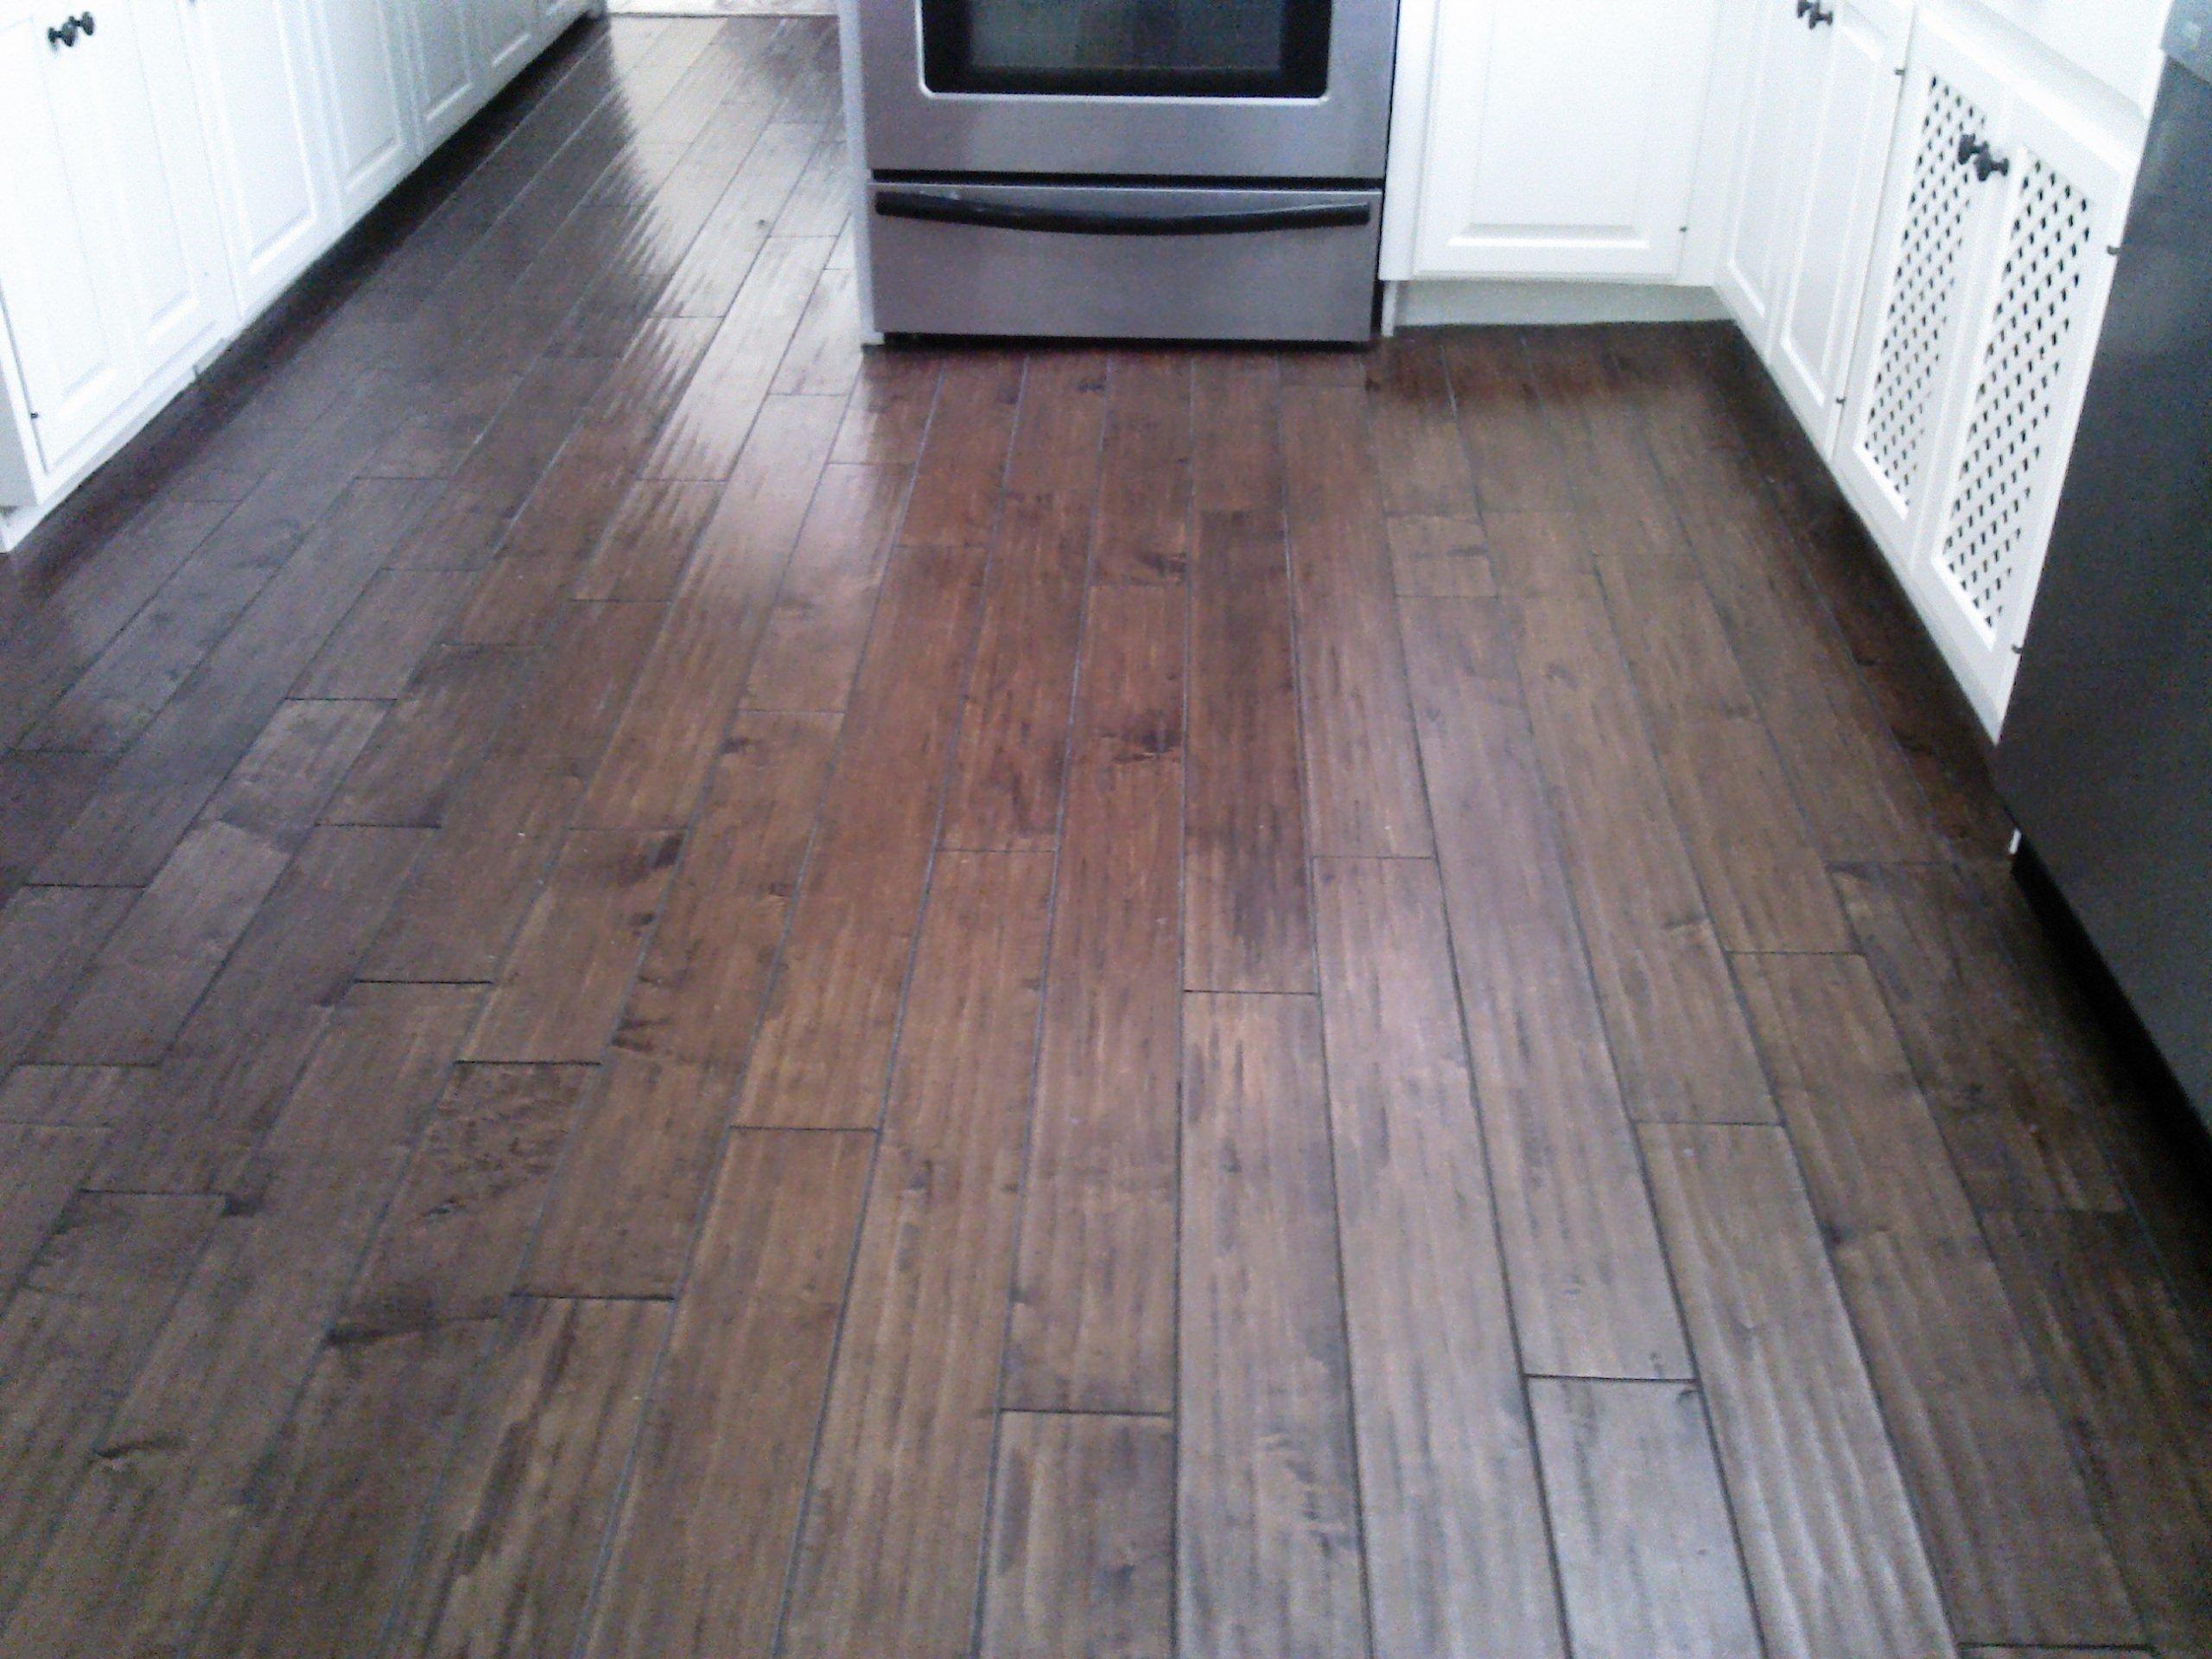 Laminate wood flooring in kitchen ratings reviews dailygadgetfo Choice Image